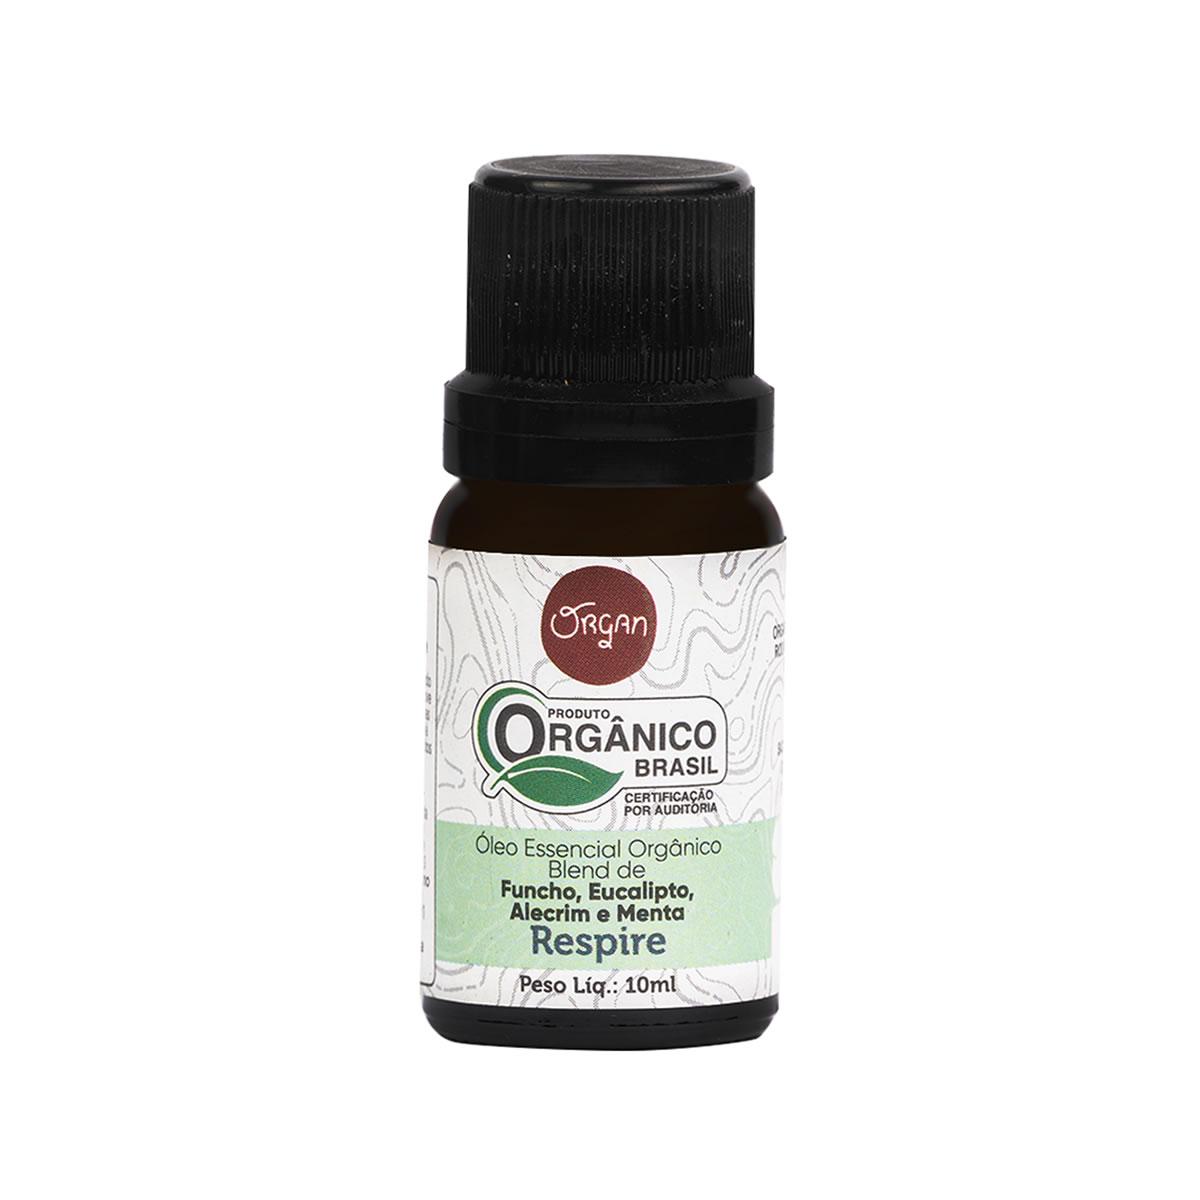 Óleo Essencial Orgânico Respire 10ml - Organ